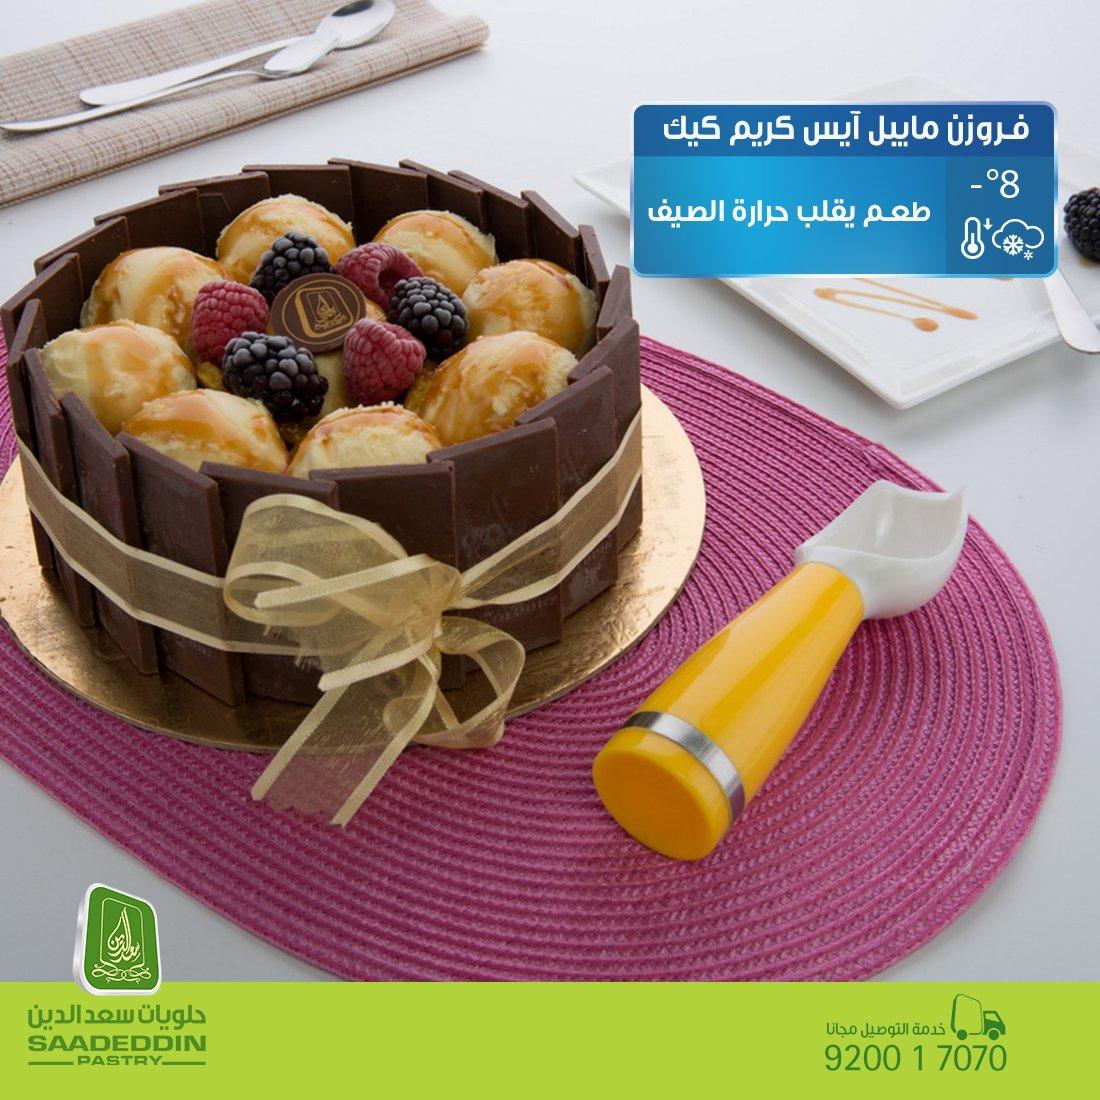 Saadeddinpastry حلويات سعدالدين Twitterren فروع المنطقة الشرقيه تفتح يوم الجمعة من 1 الظهر الى 11 الليل